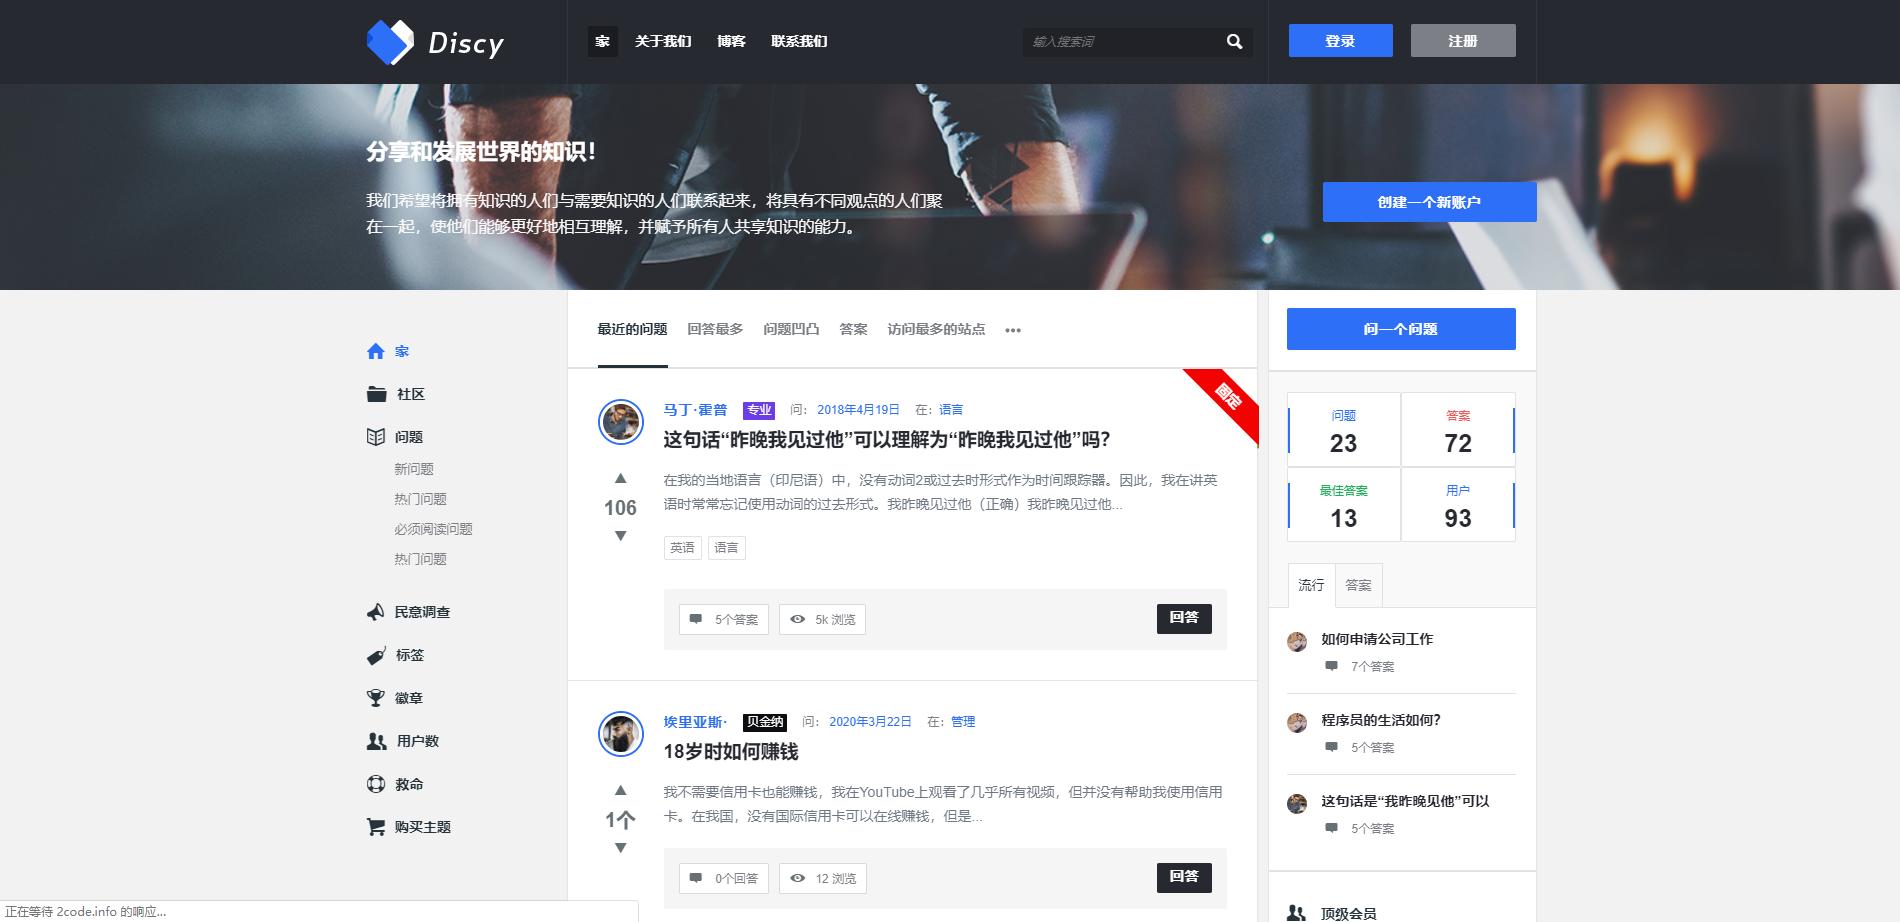 WordPress主题Discy-v3.8.1社会问答